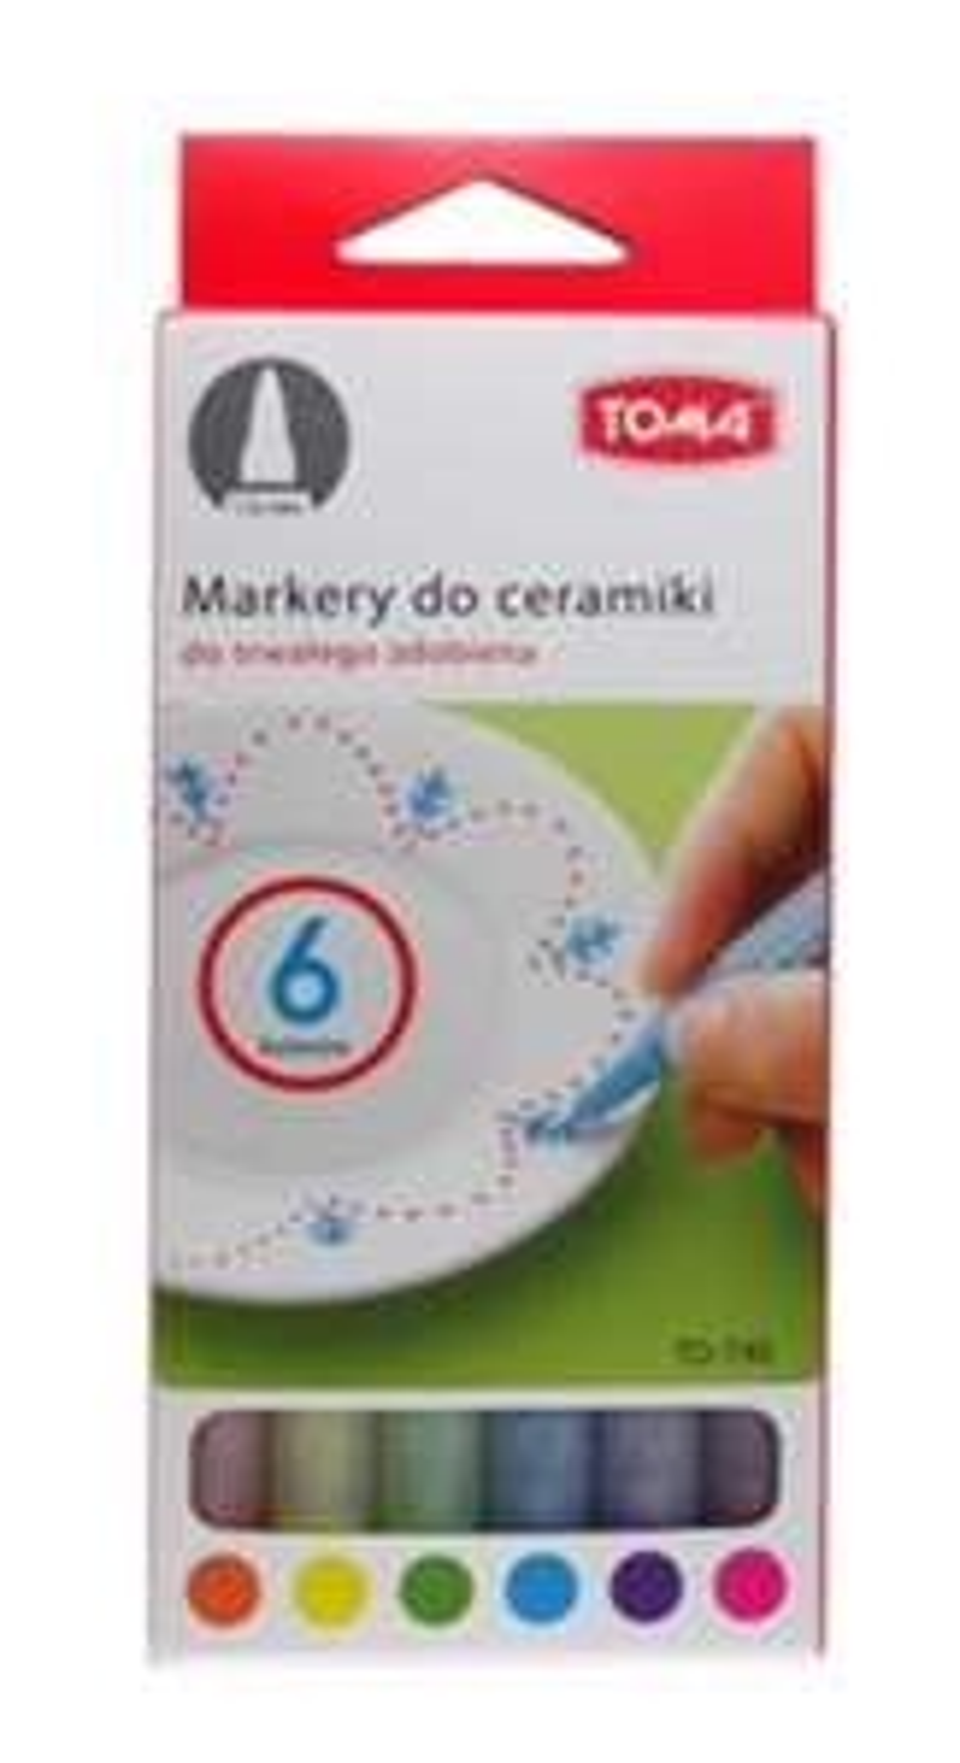 Markery do ceramiki Toma za 9,97zł (6szt.) @ Komfort